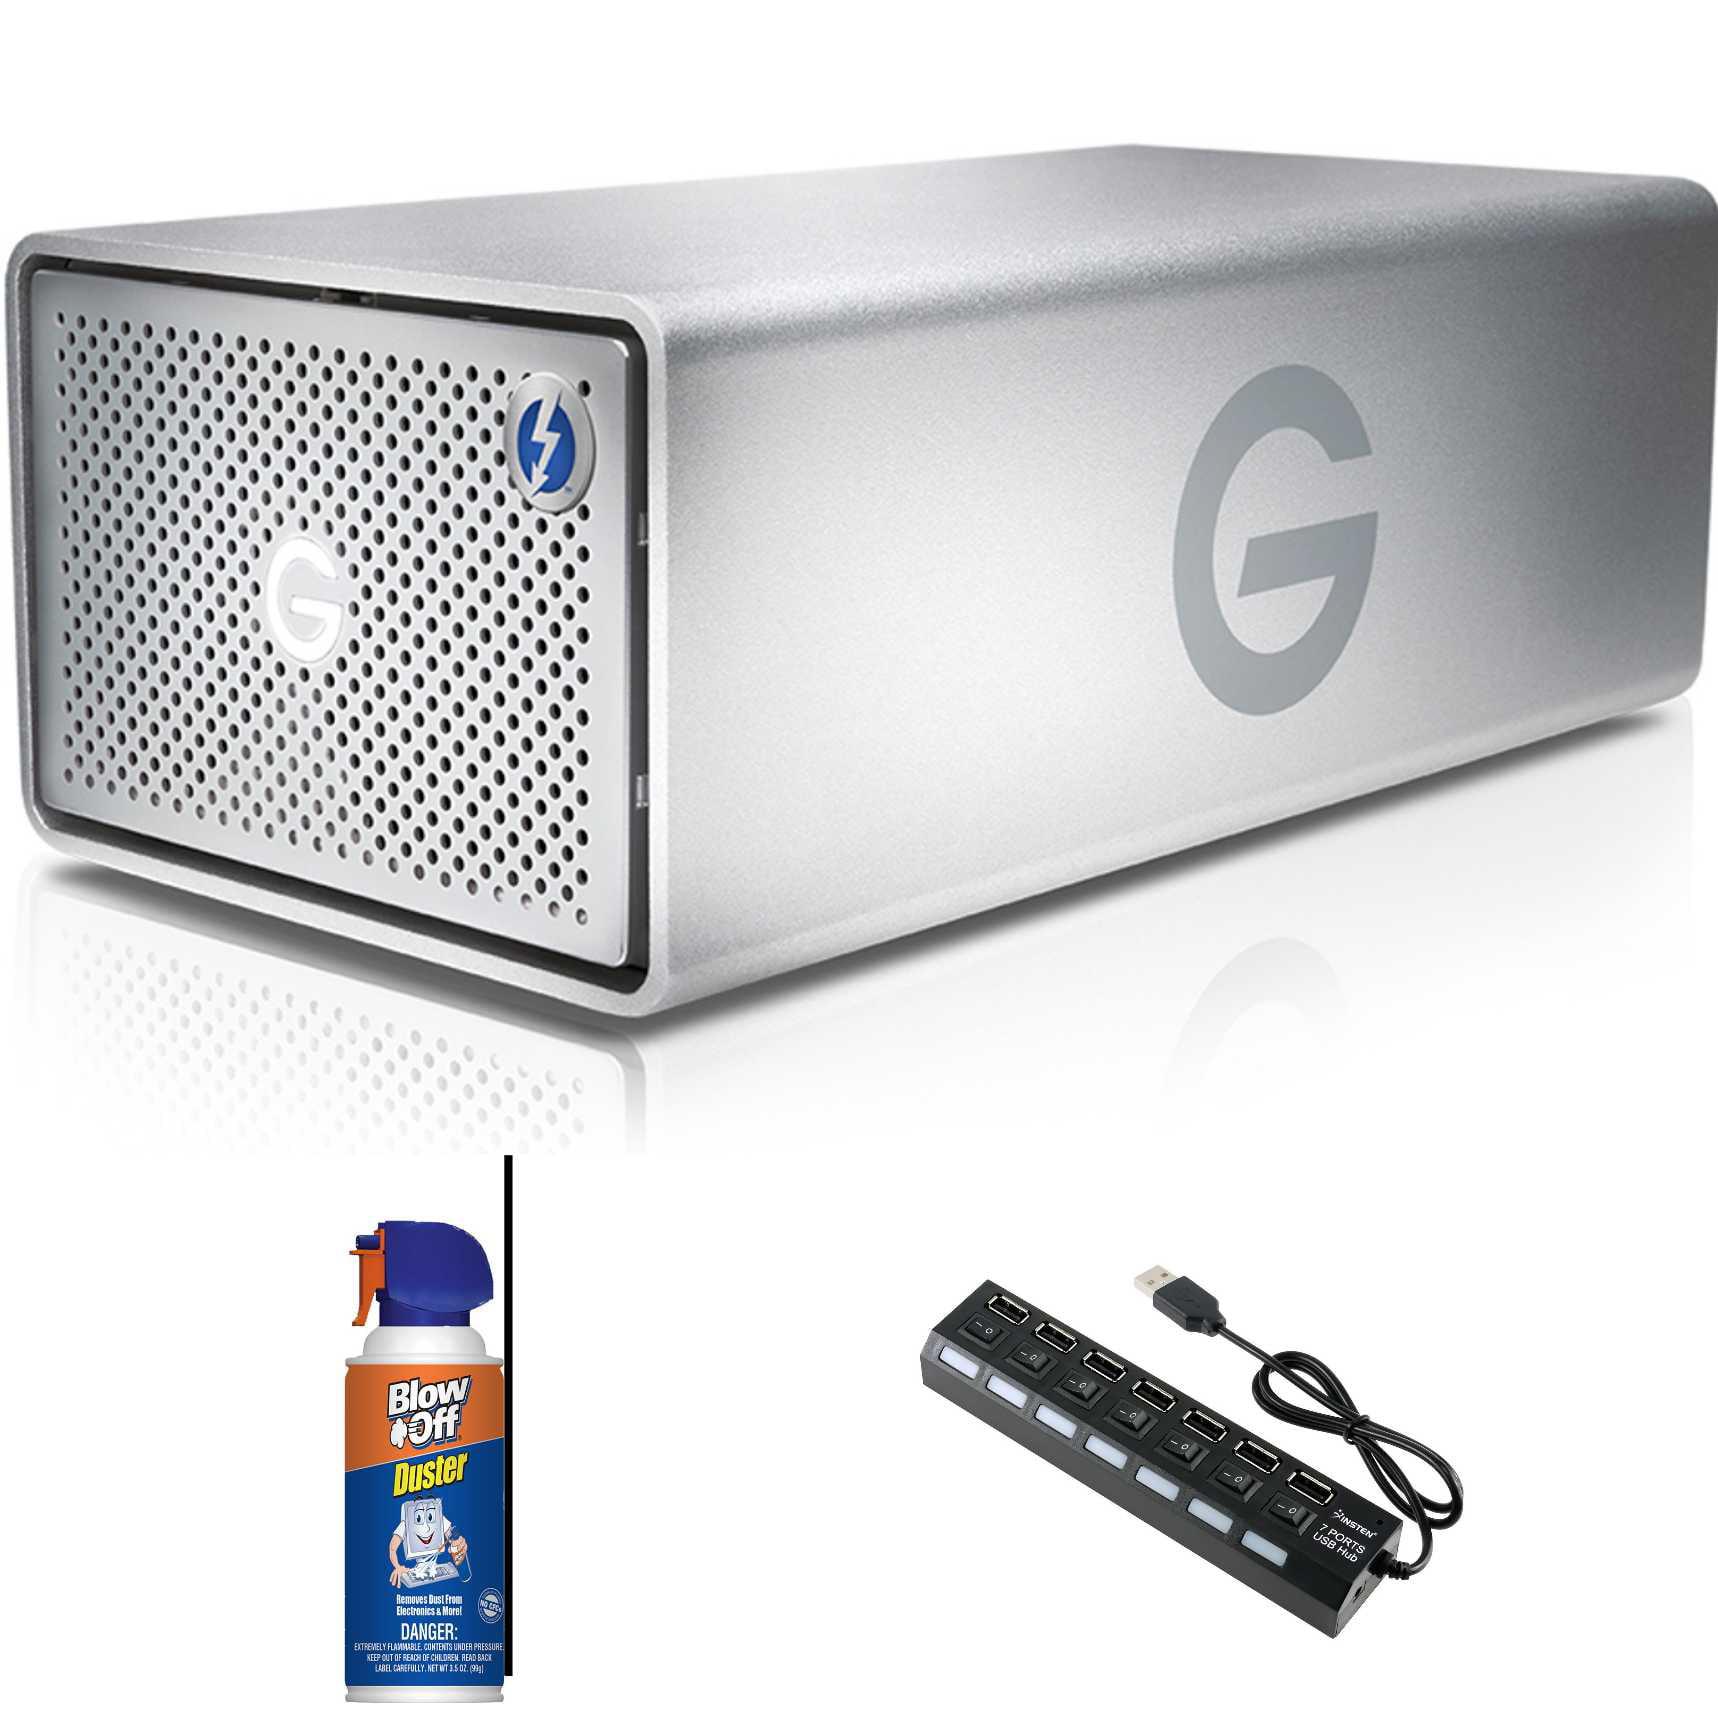 G-Technology 8TB G-RAID Thunderbolt Removable Dual Drive Bundle